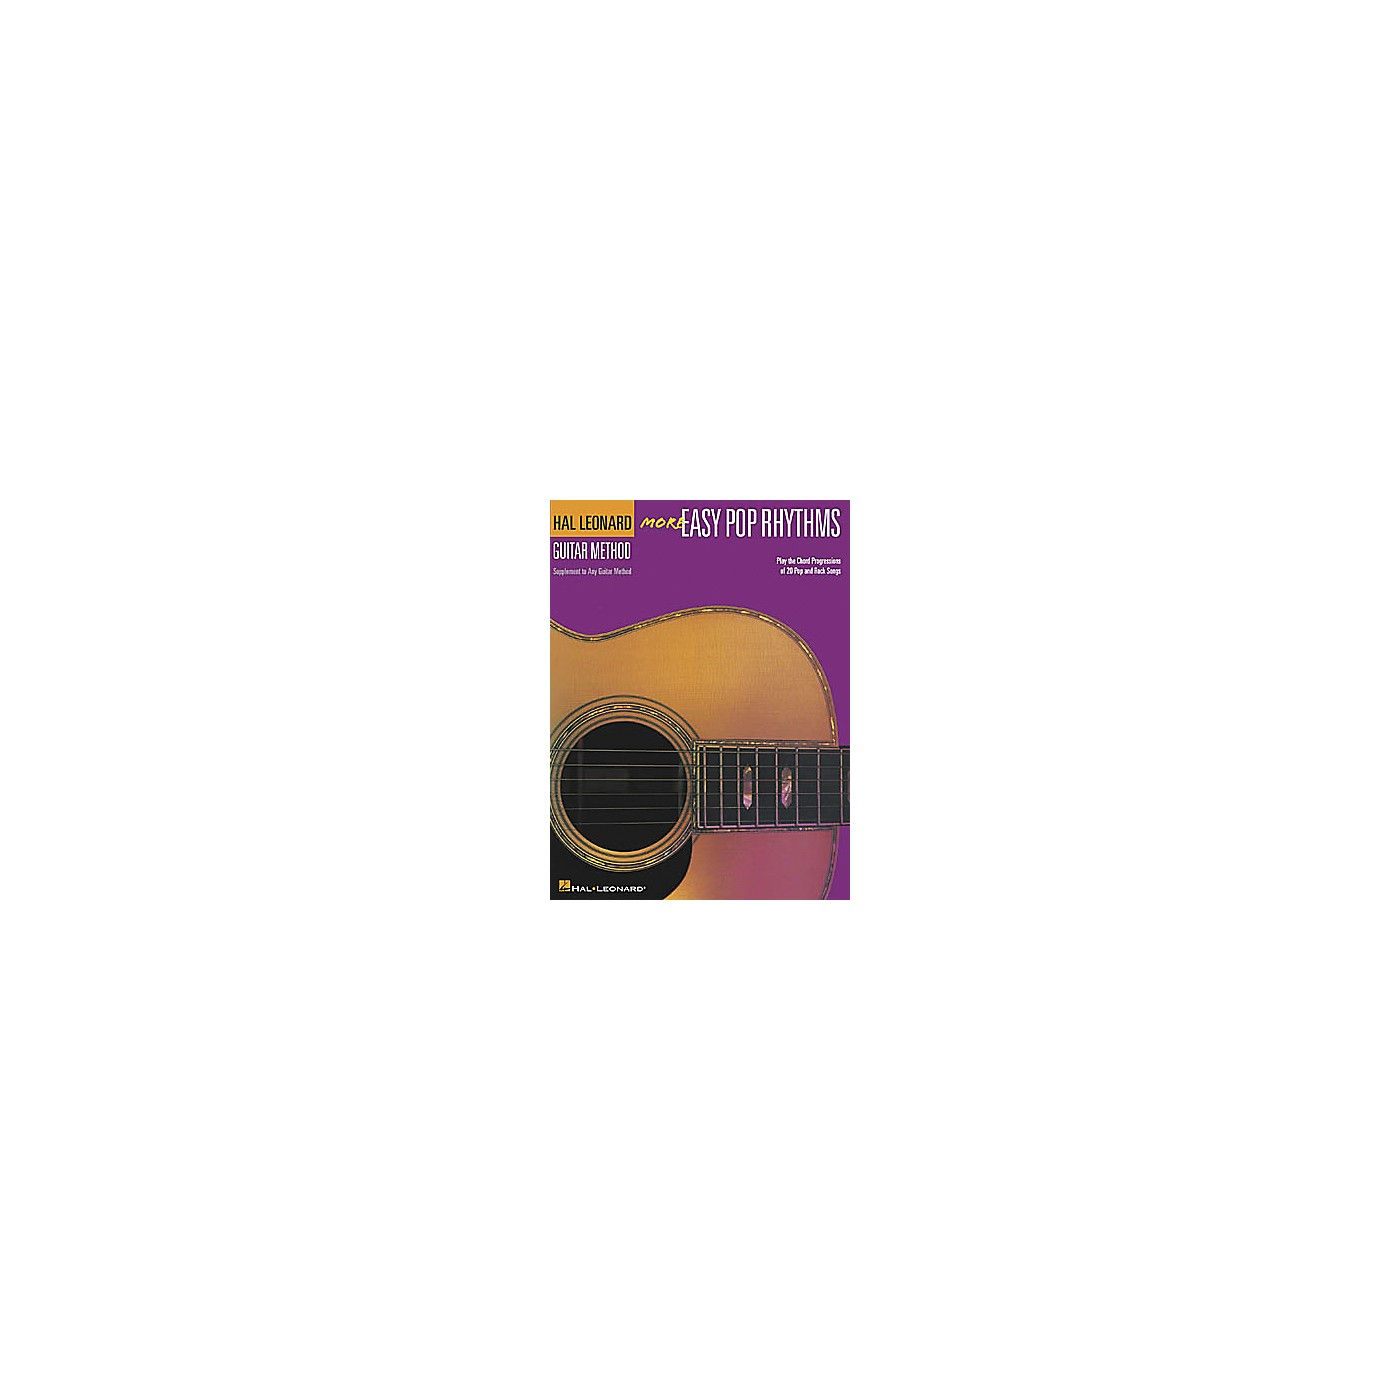 Hal Leonard More Easy Pop Rhythms - 2nd Edition Guitar Method Book thumbnail